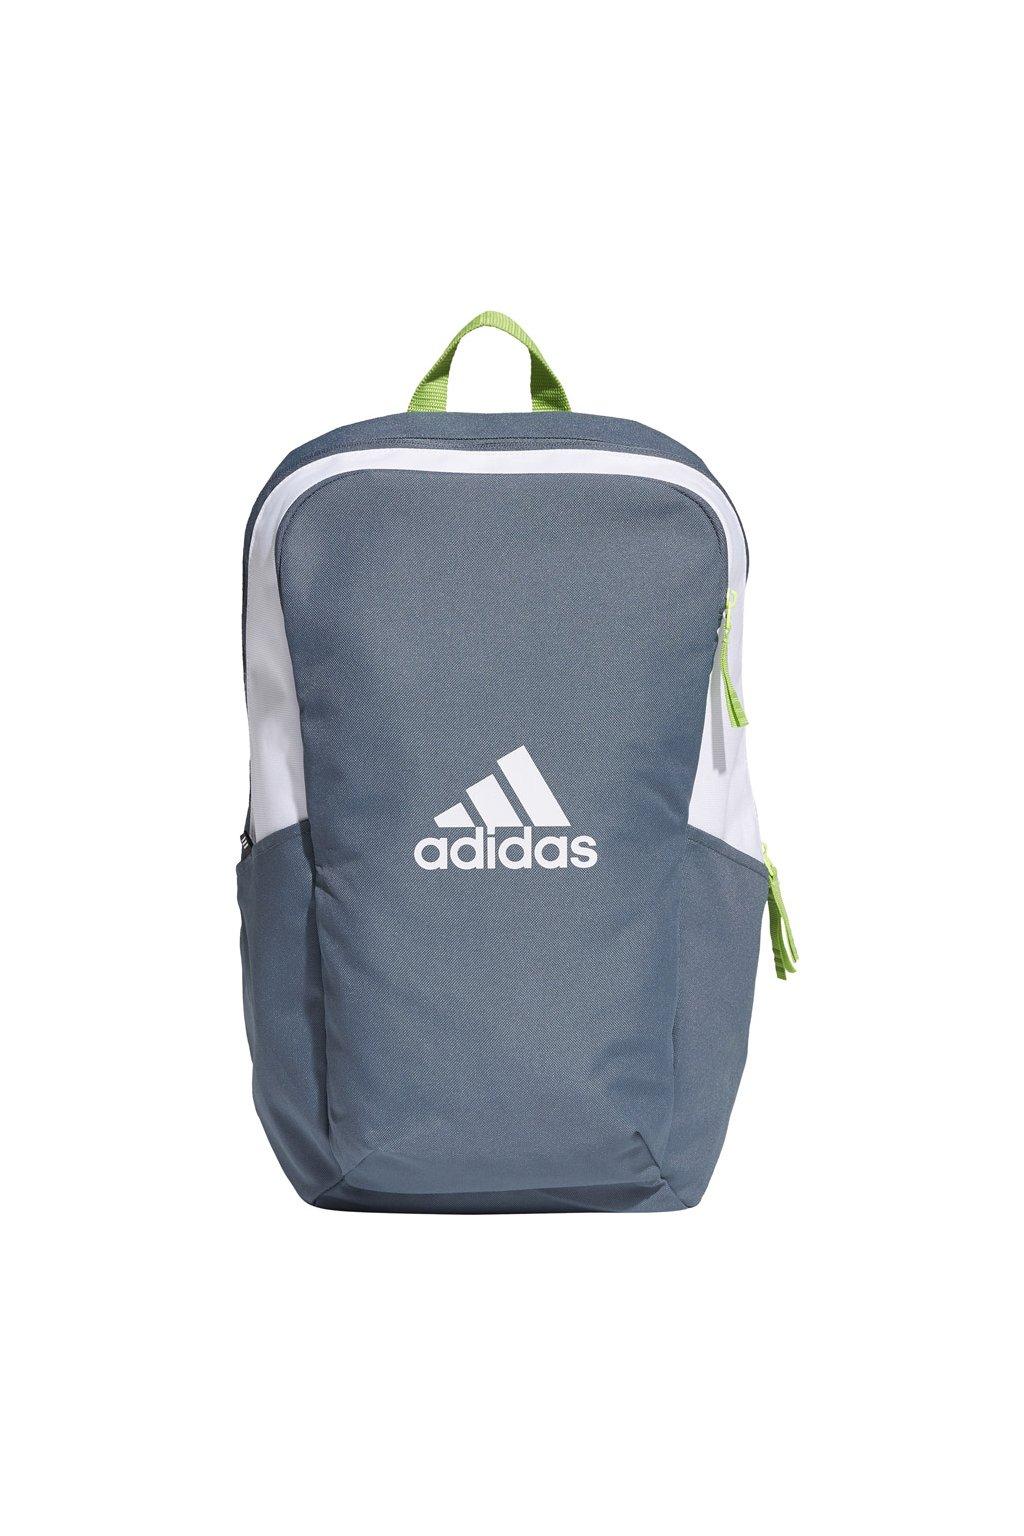 Batoh adidas Parkhood modrý FS0276